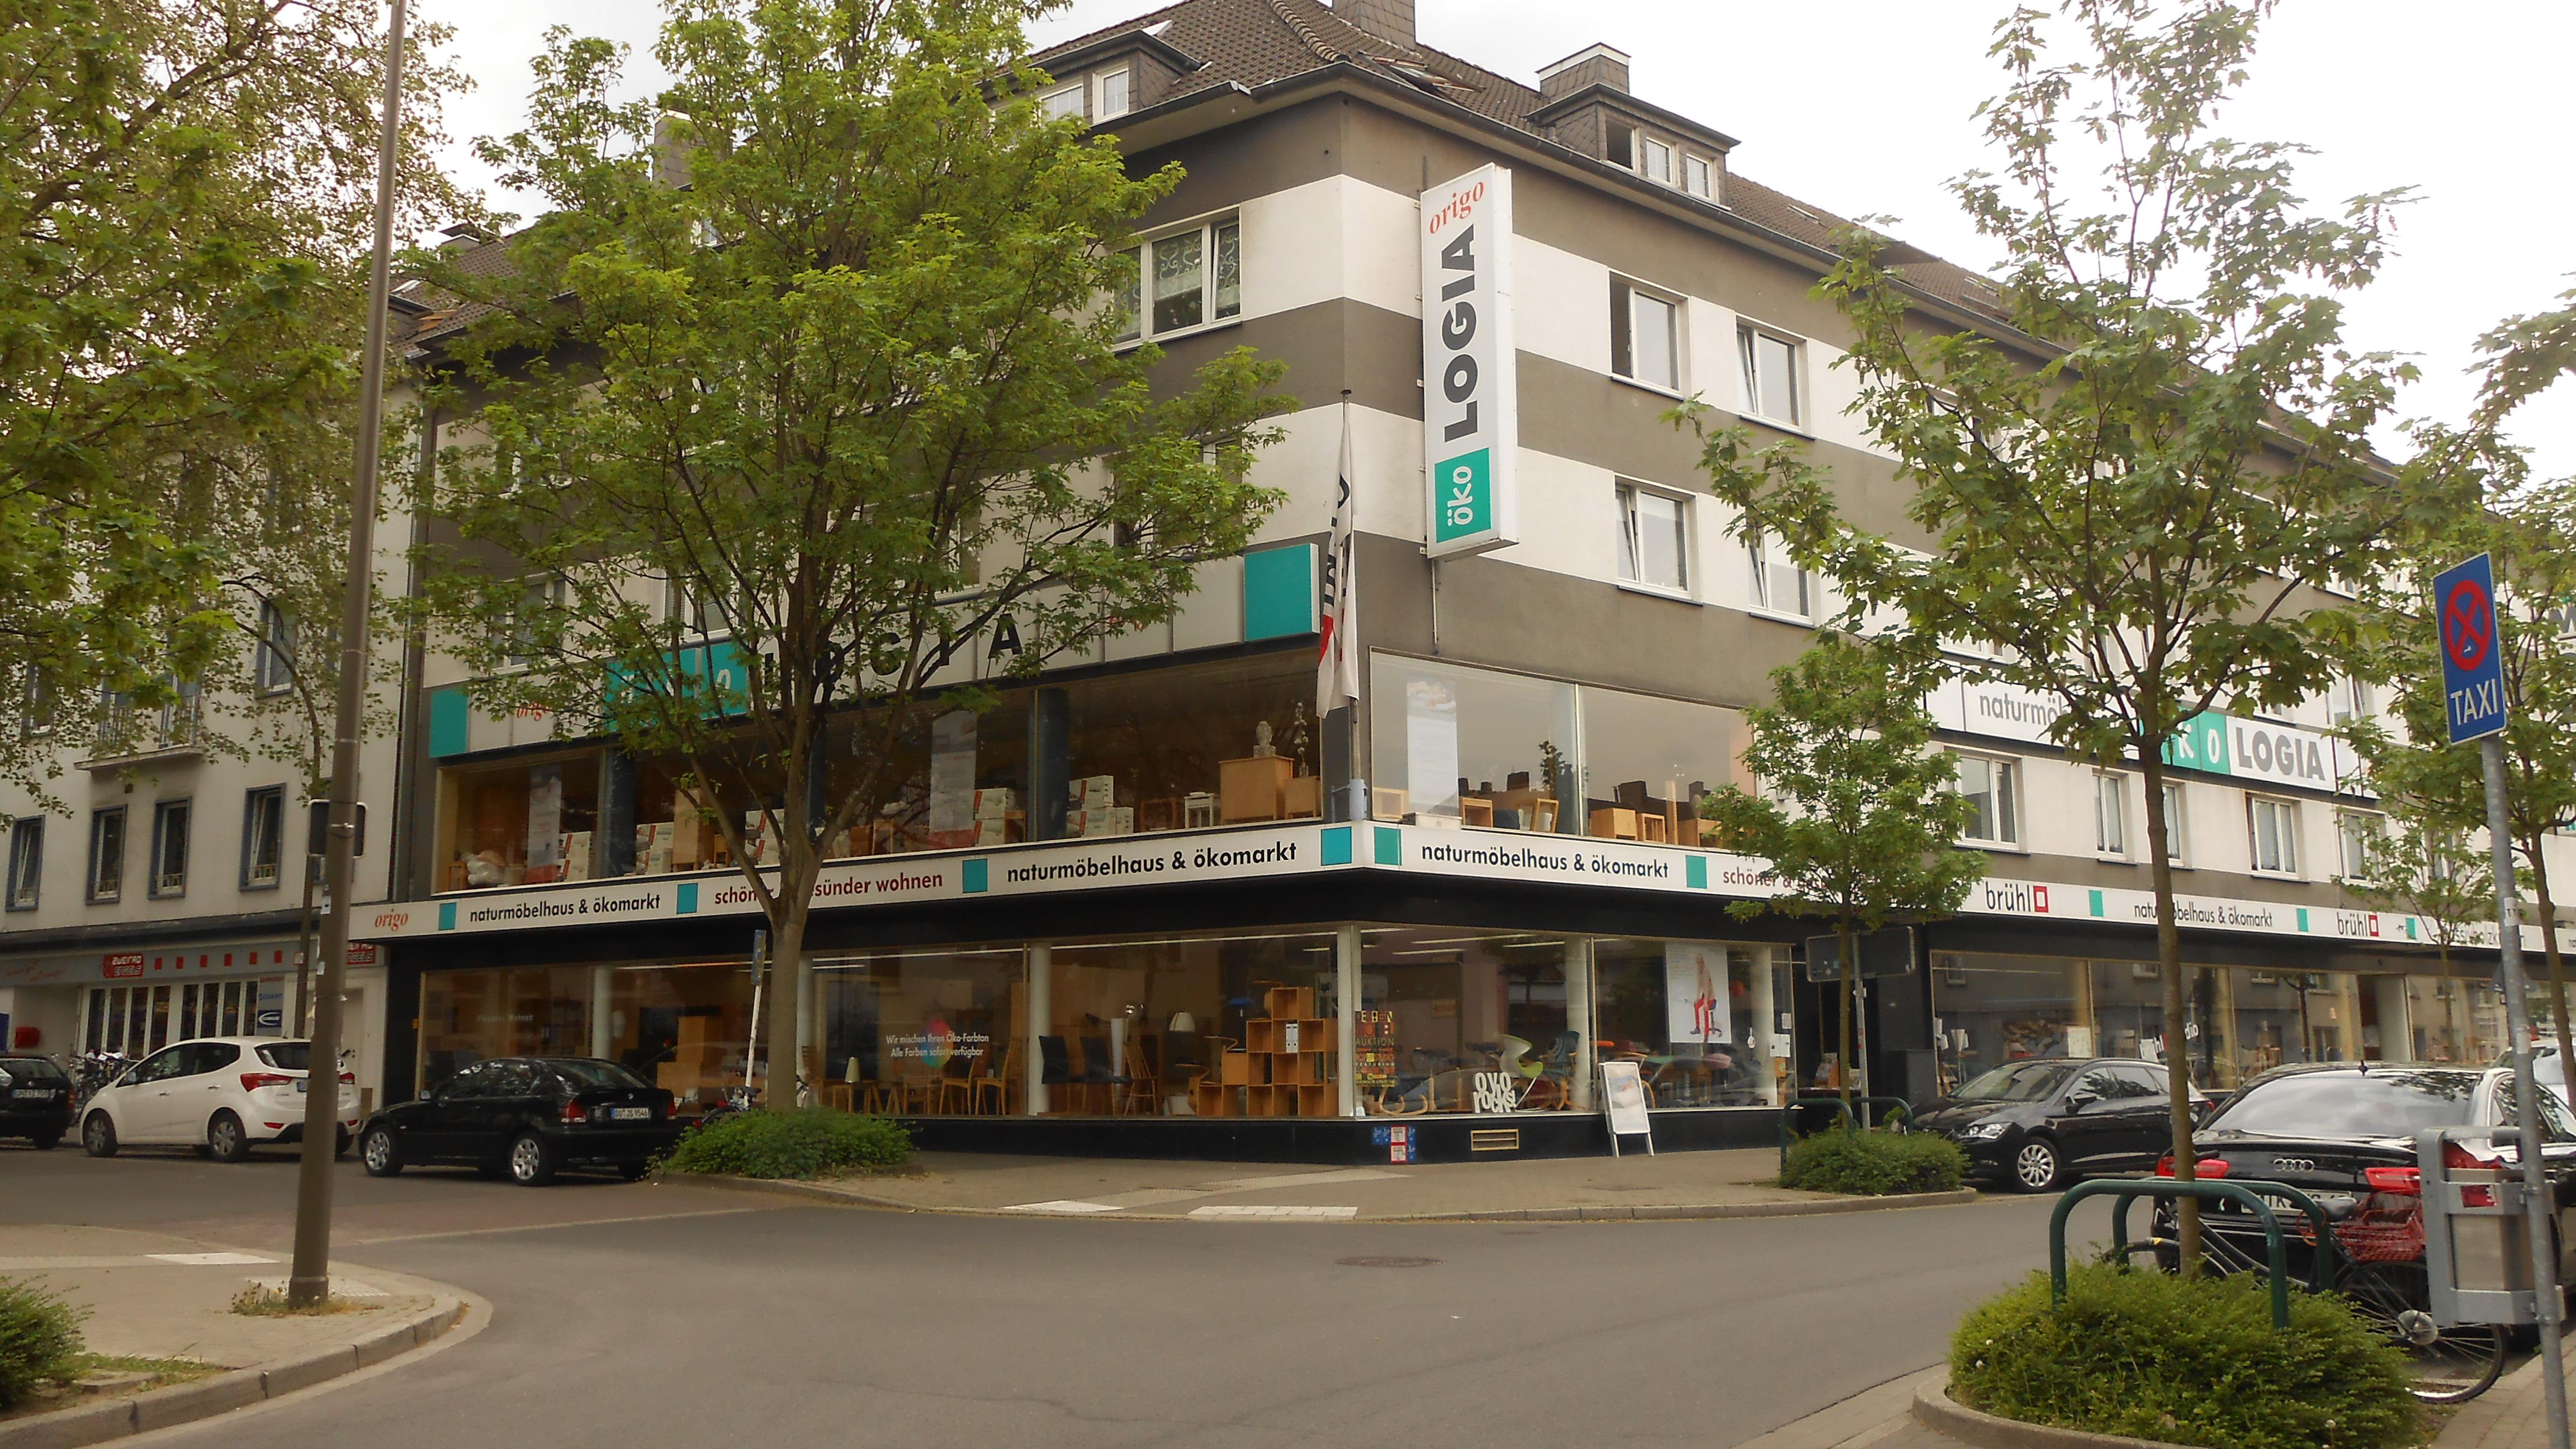 Möbelhaus In Dortmund file ökologia möbelhaus dortmund jpg wikimedia commons